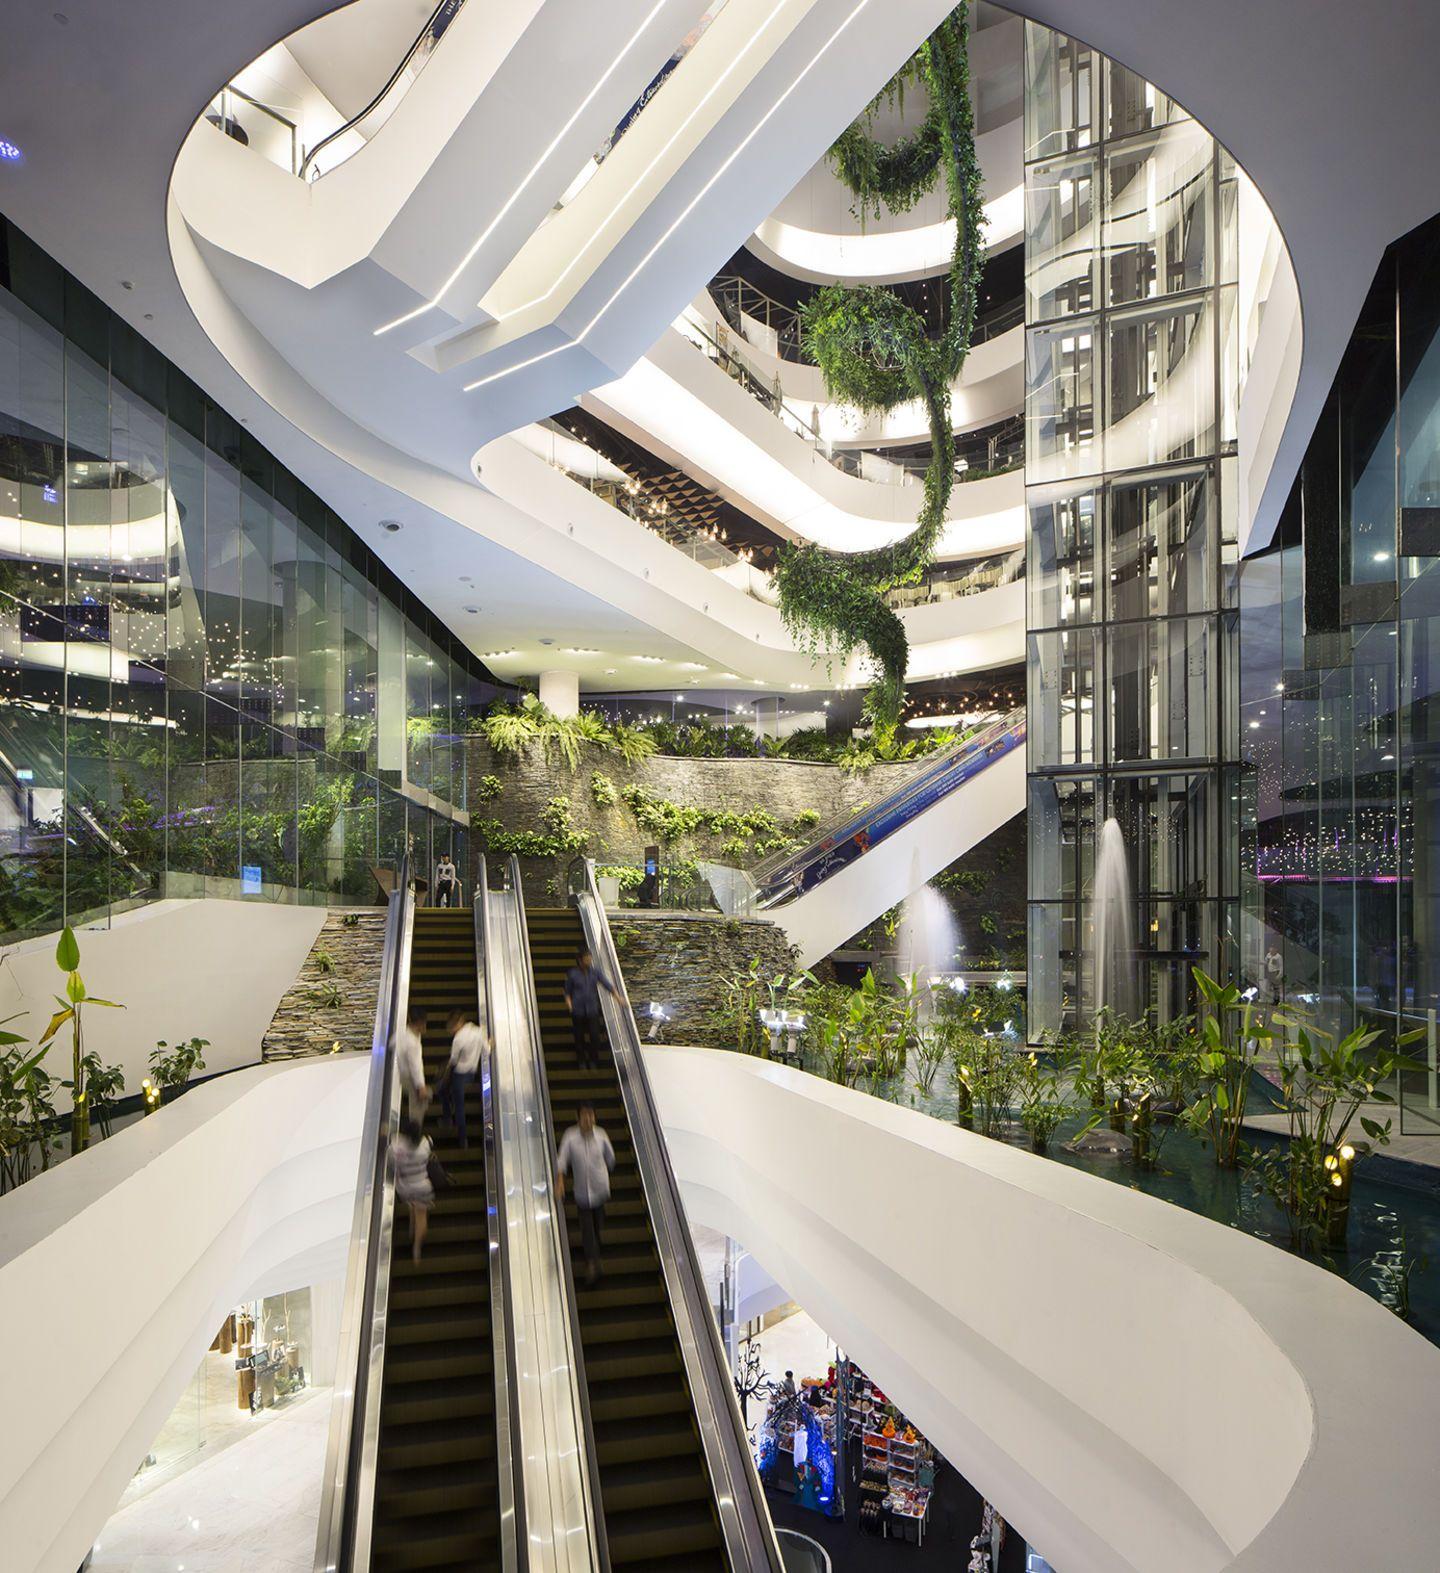 Boiffils architectures luc boegly emquartier divisare for Ads architectural design services